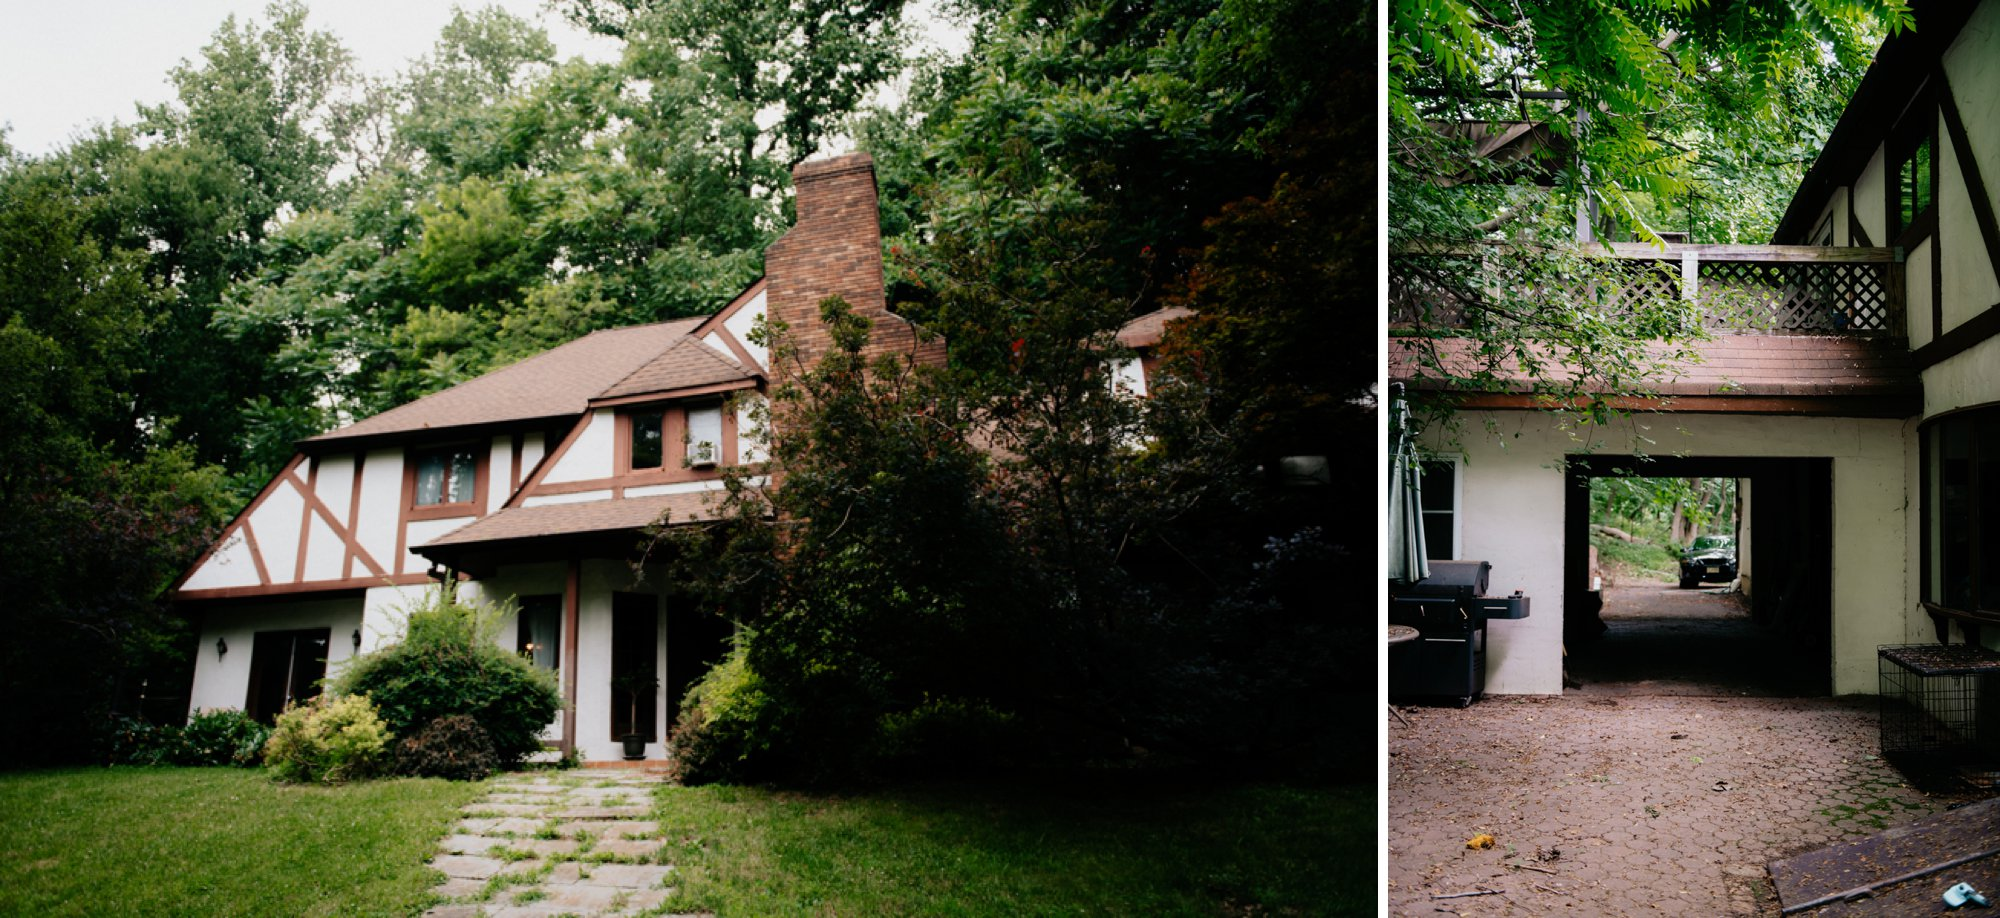 Philadelphia New Jersey Jockey Hollow Wedding Abandoned Athletic Courts Porche Jimmy Choos Family Home